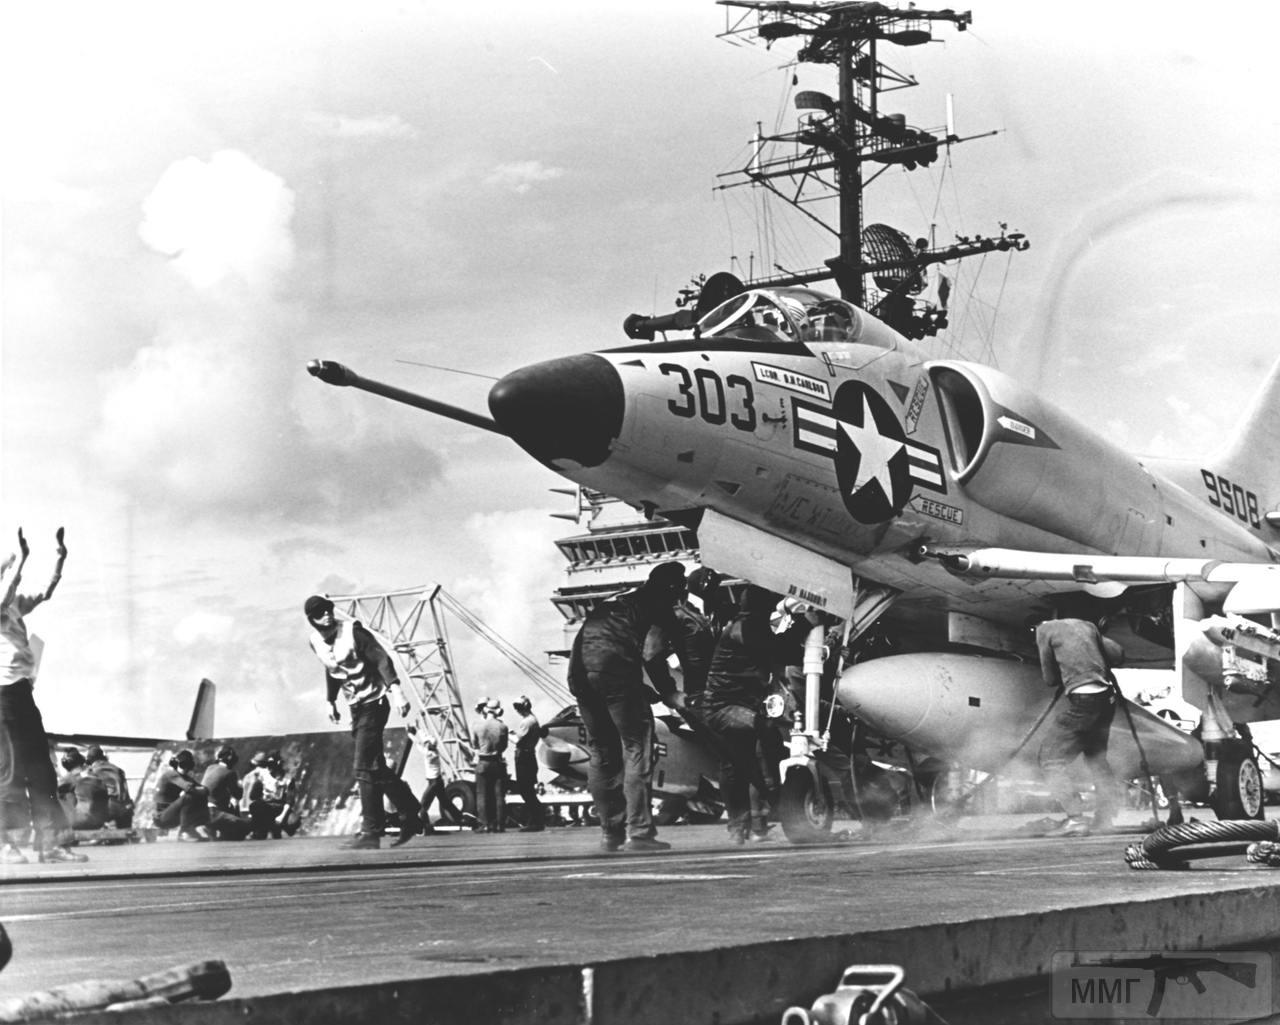 41612 - Бомбардировки Северного Вьетнама